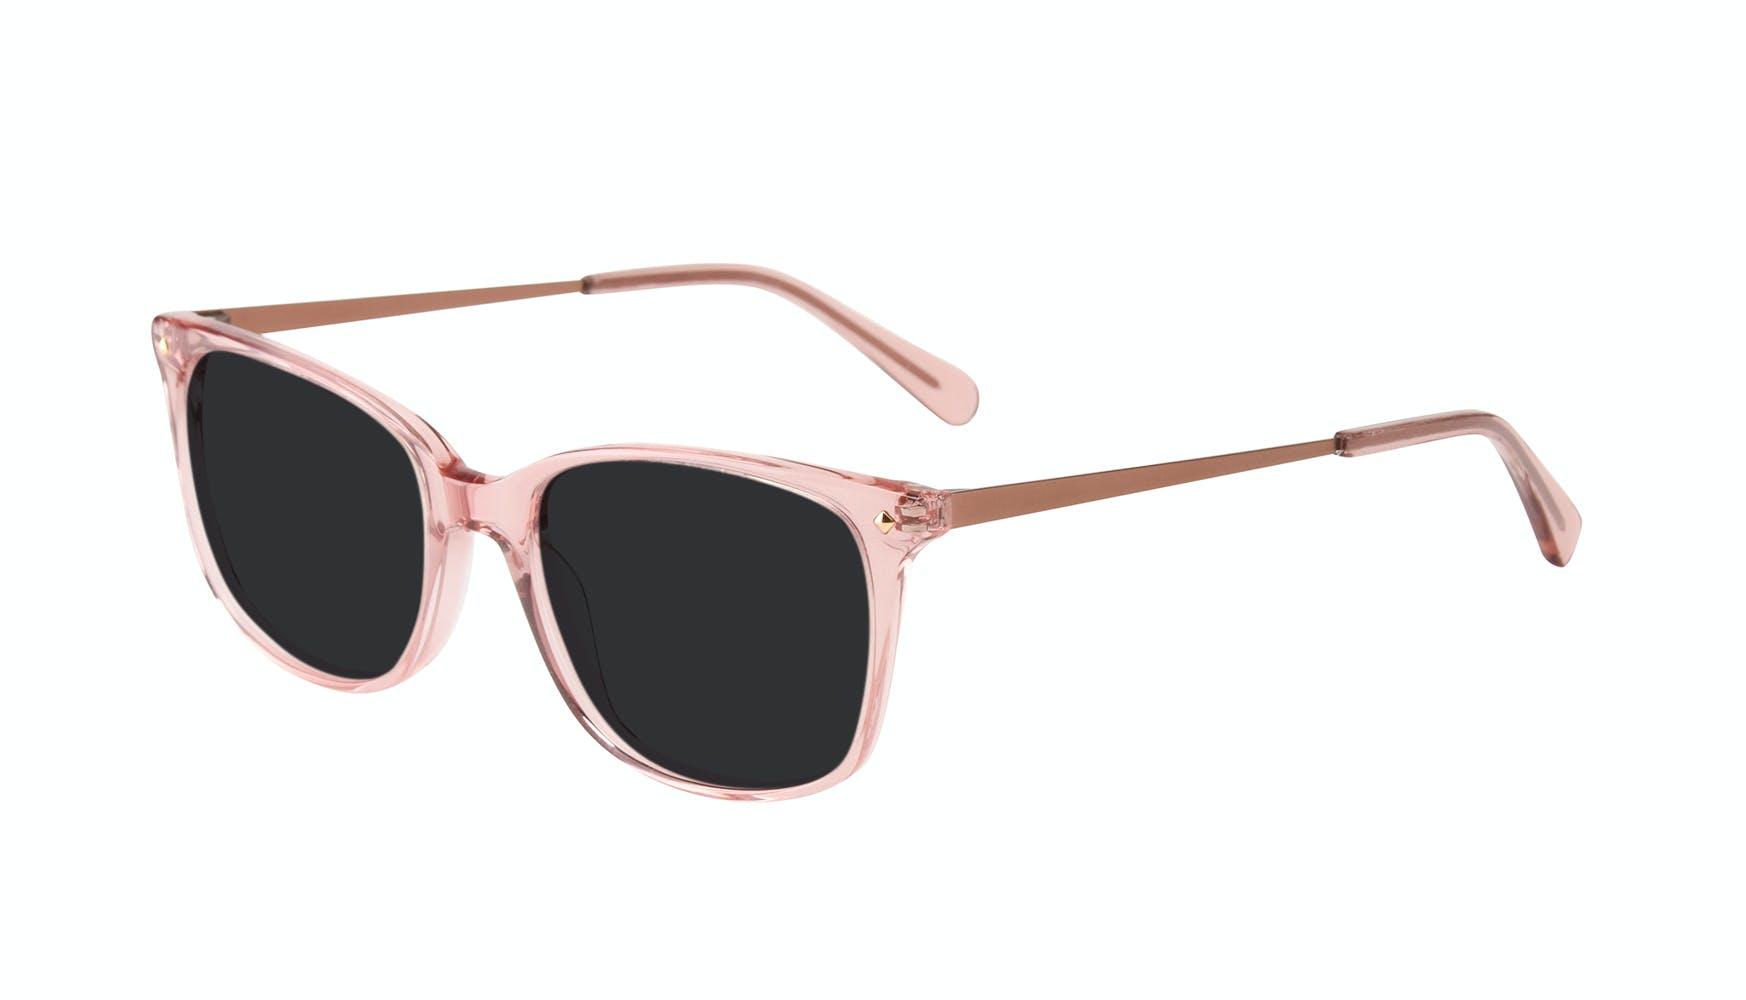 Affordable Fashion Glasses Rectangle Square Sunglasses Women Refine Rose Tilt